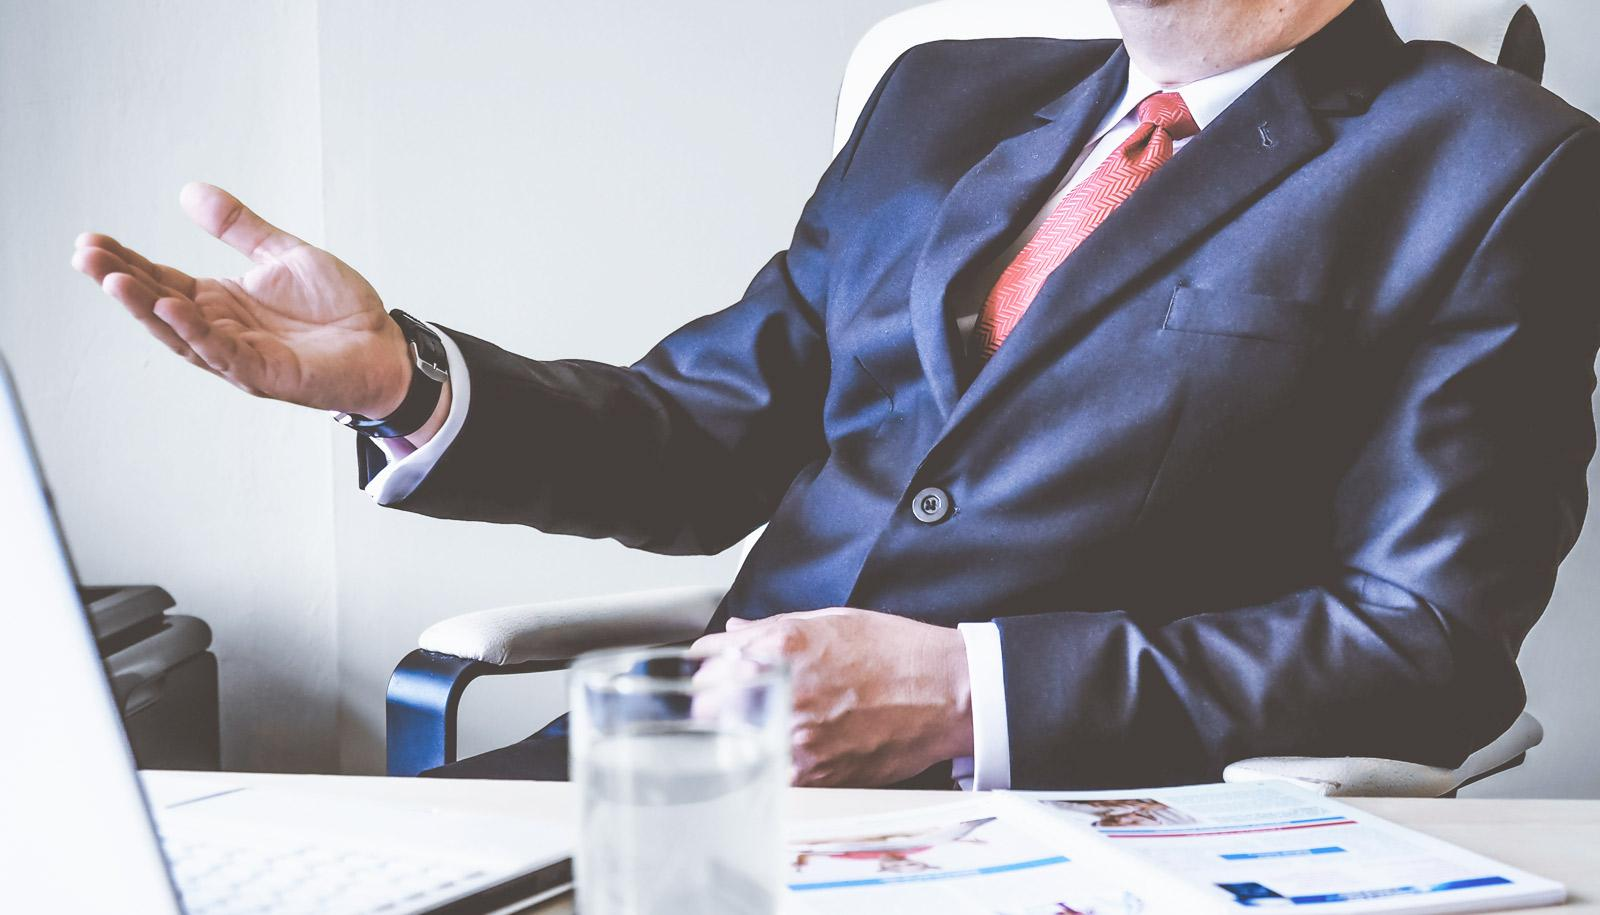 man in suit at desk gestures